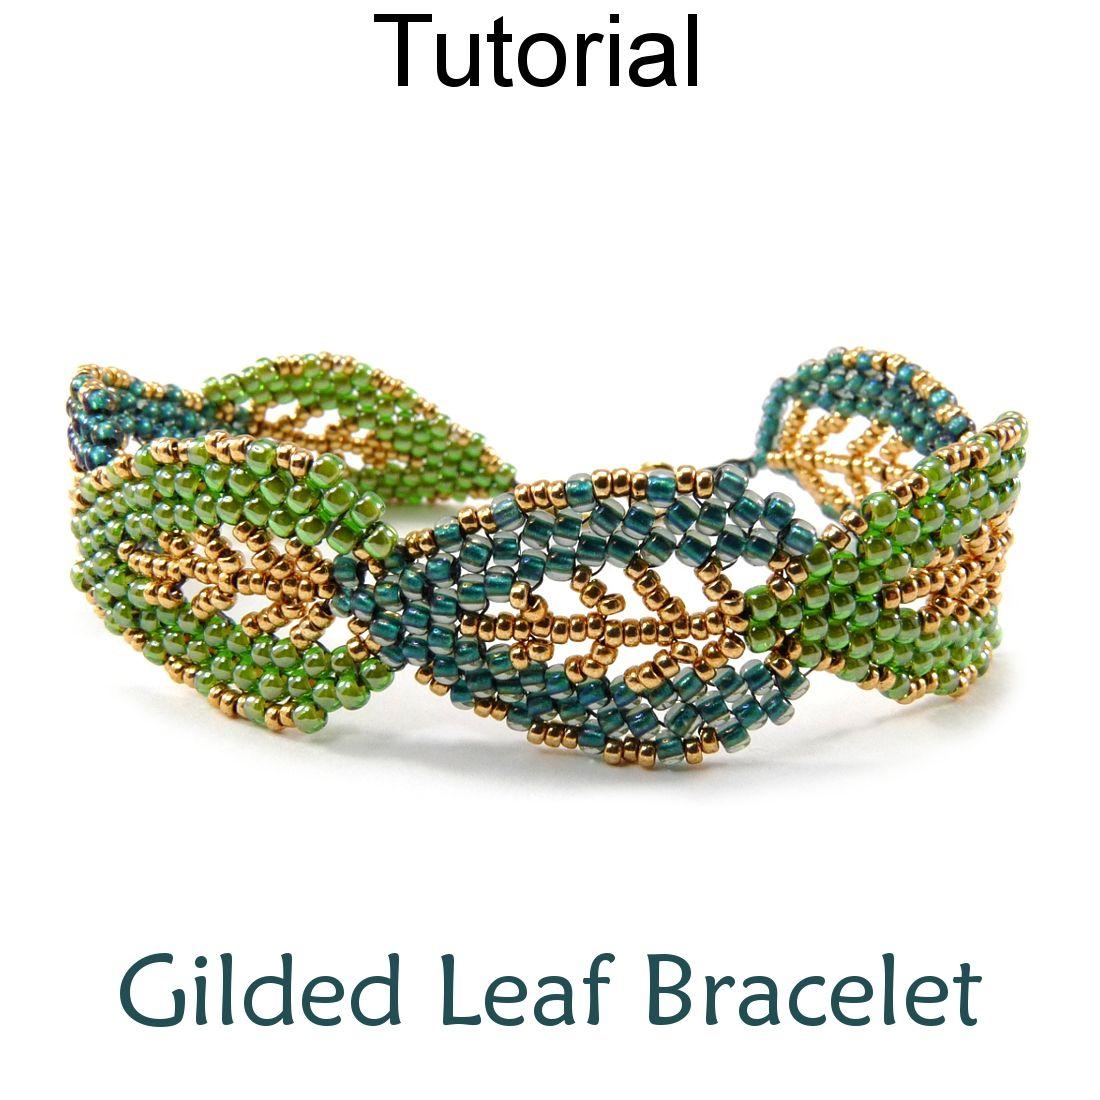 gilded leaf bracelet beaded russian leaves beading tutorial pattern simple bead patterns - Beaded Bracelet Design Ideas